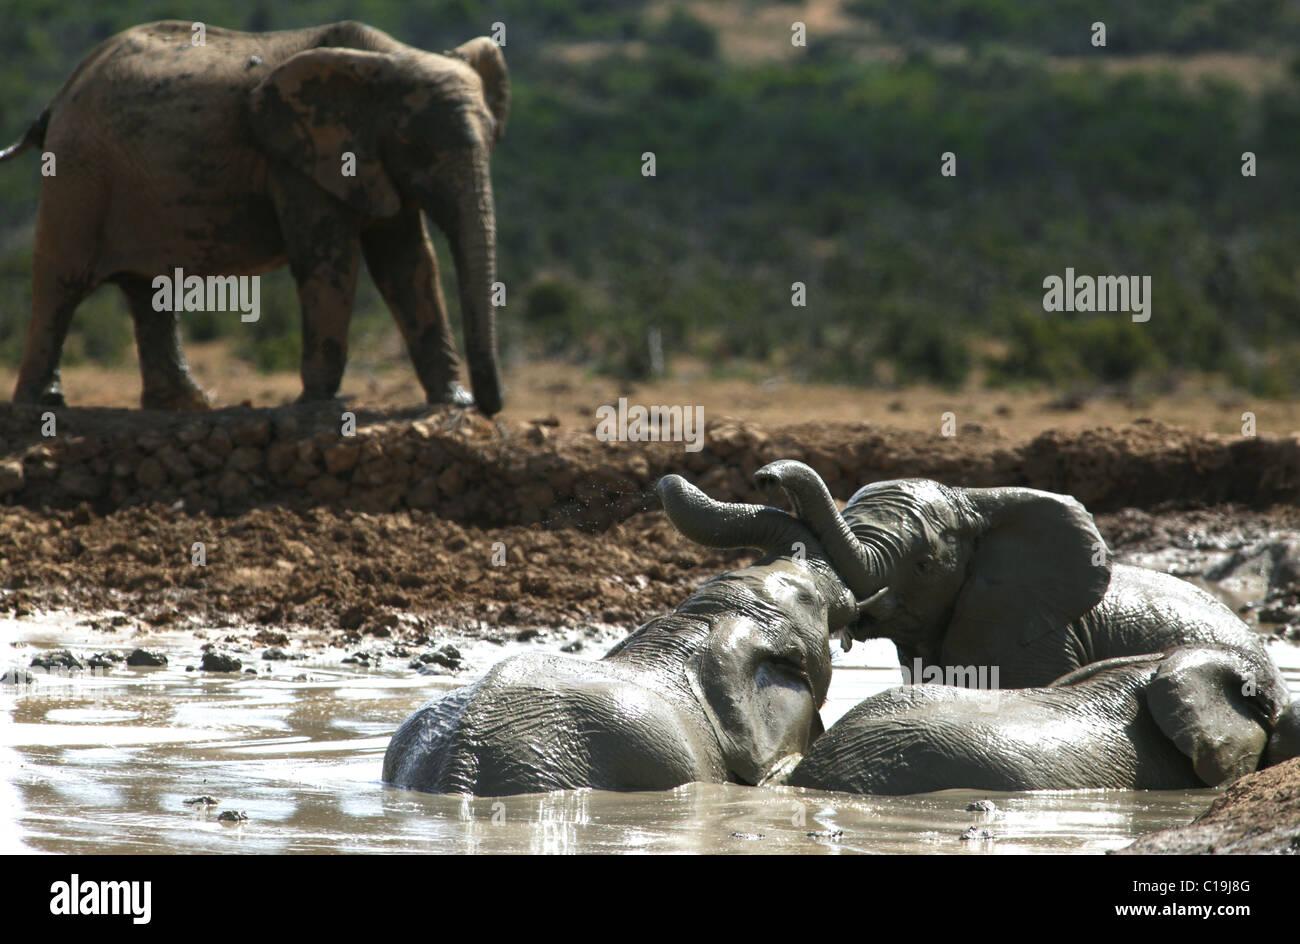 BRAUN & grau afrikanischen Elefanten ADDO NATIONAL PARK-Südafrika 30. Januar 2011 Stockbild